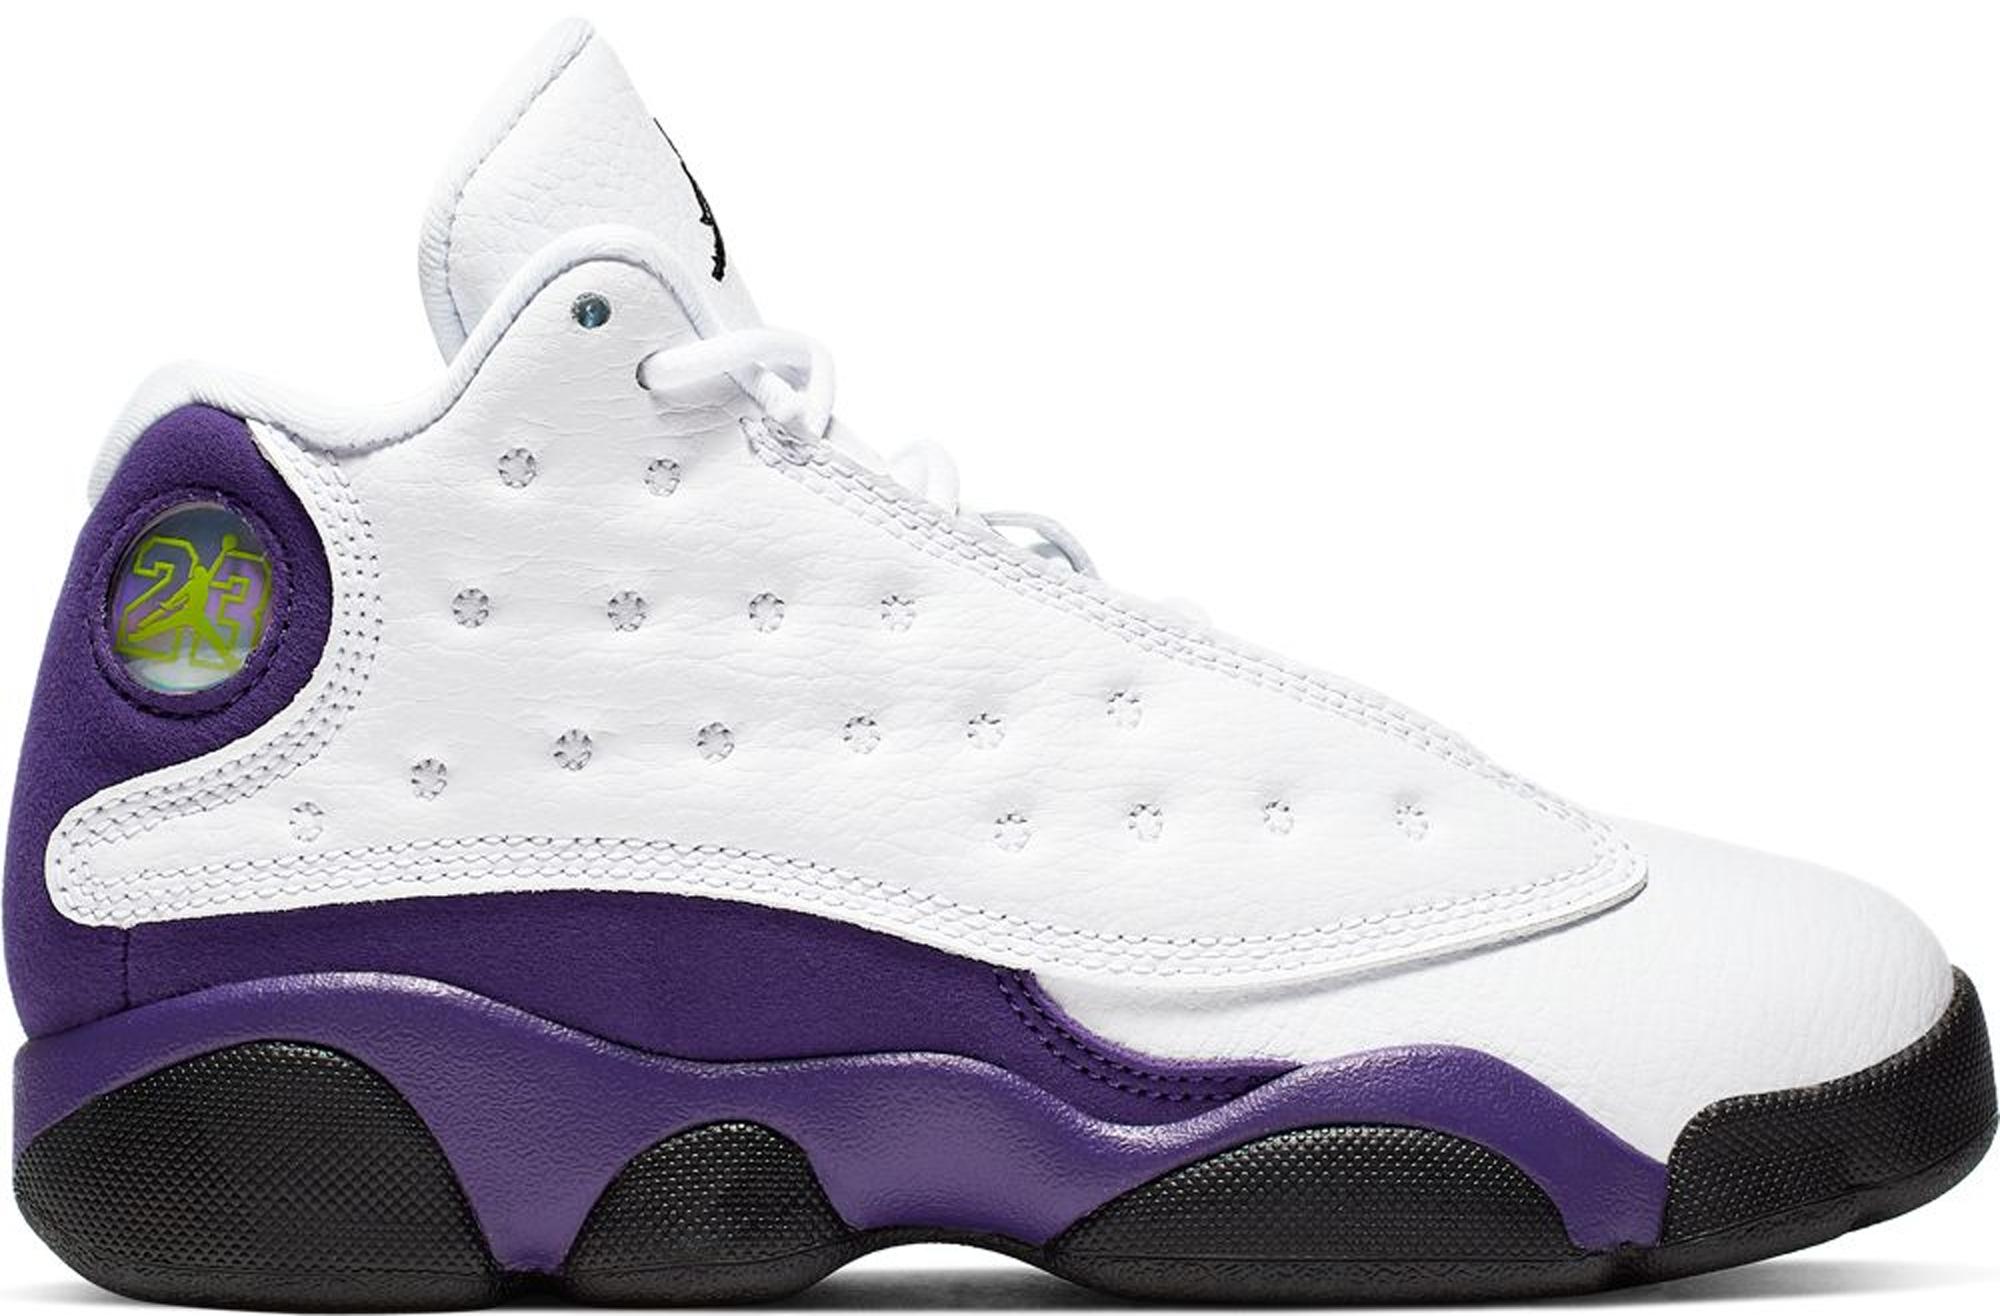 jordan 13 purple white